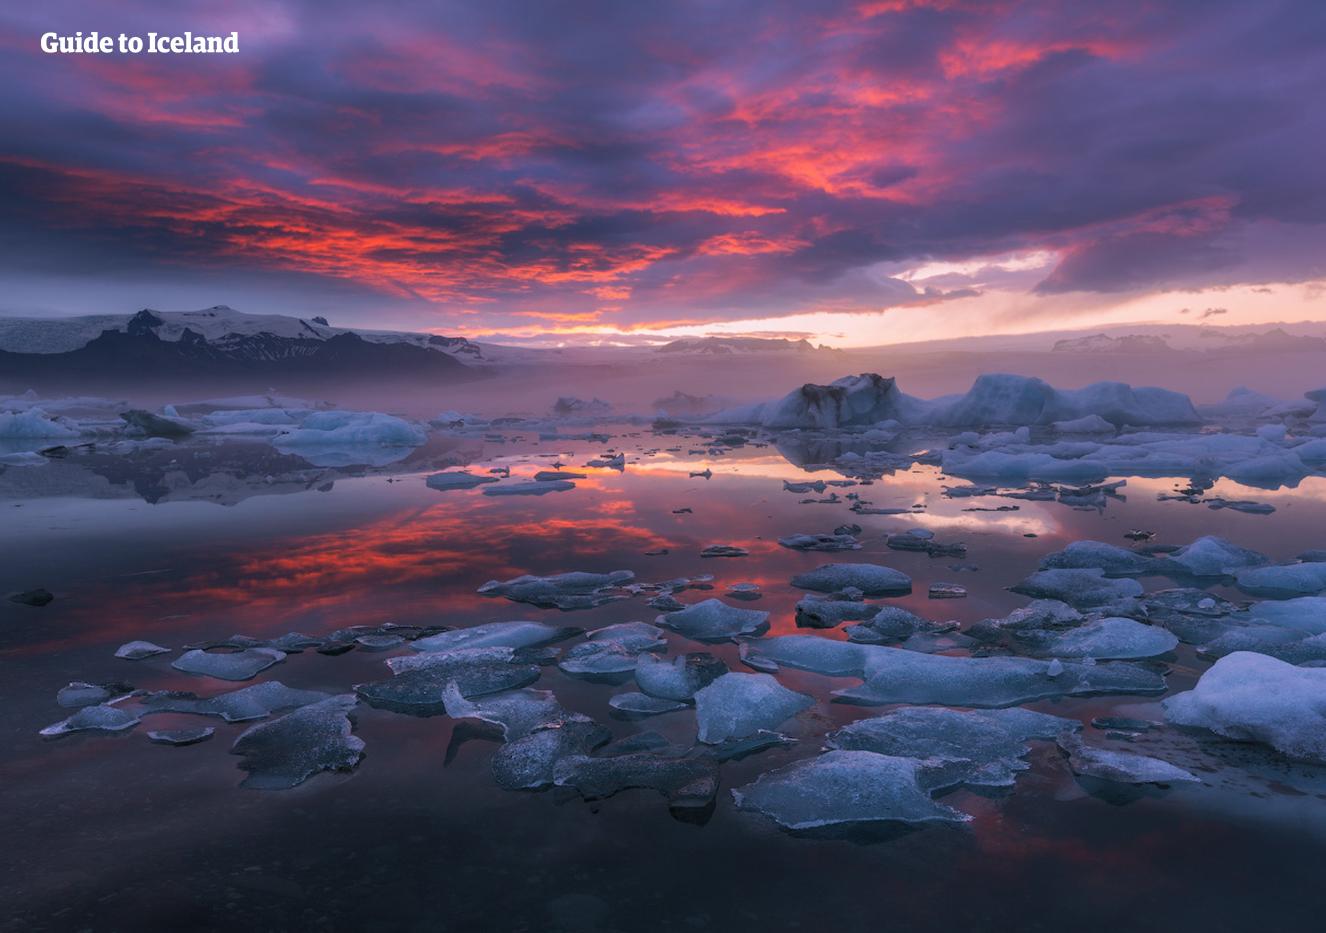 Jökulsárlón-gletsjerlagunen er et af Islands smukkeste naturfænomener.